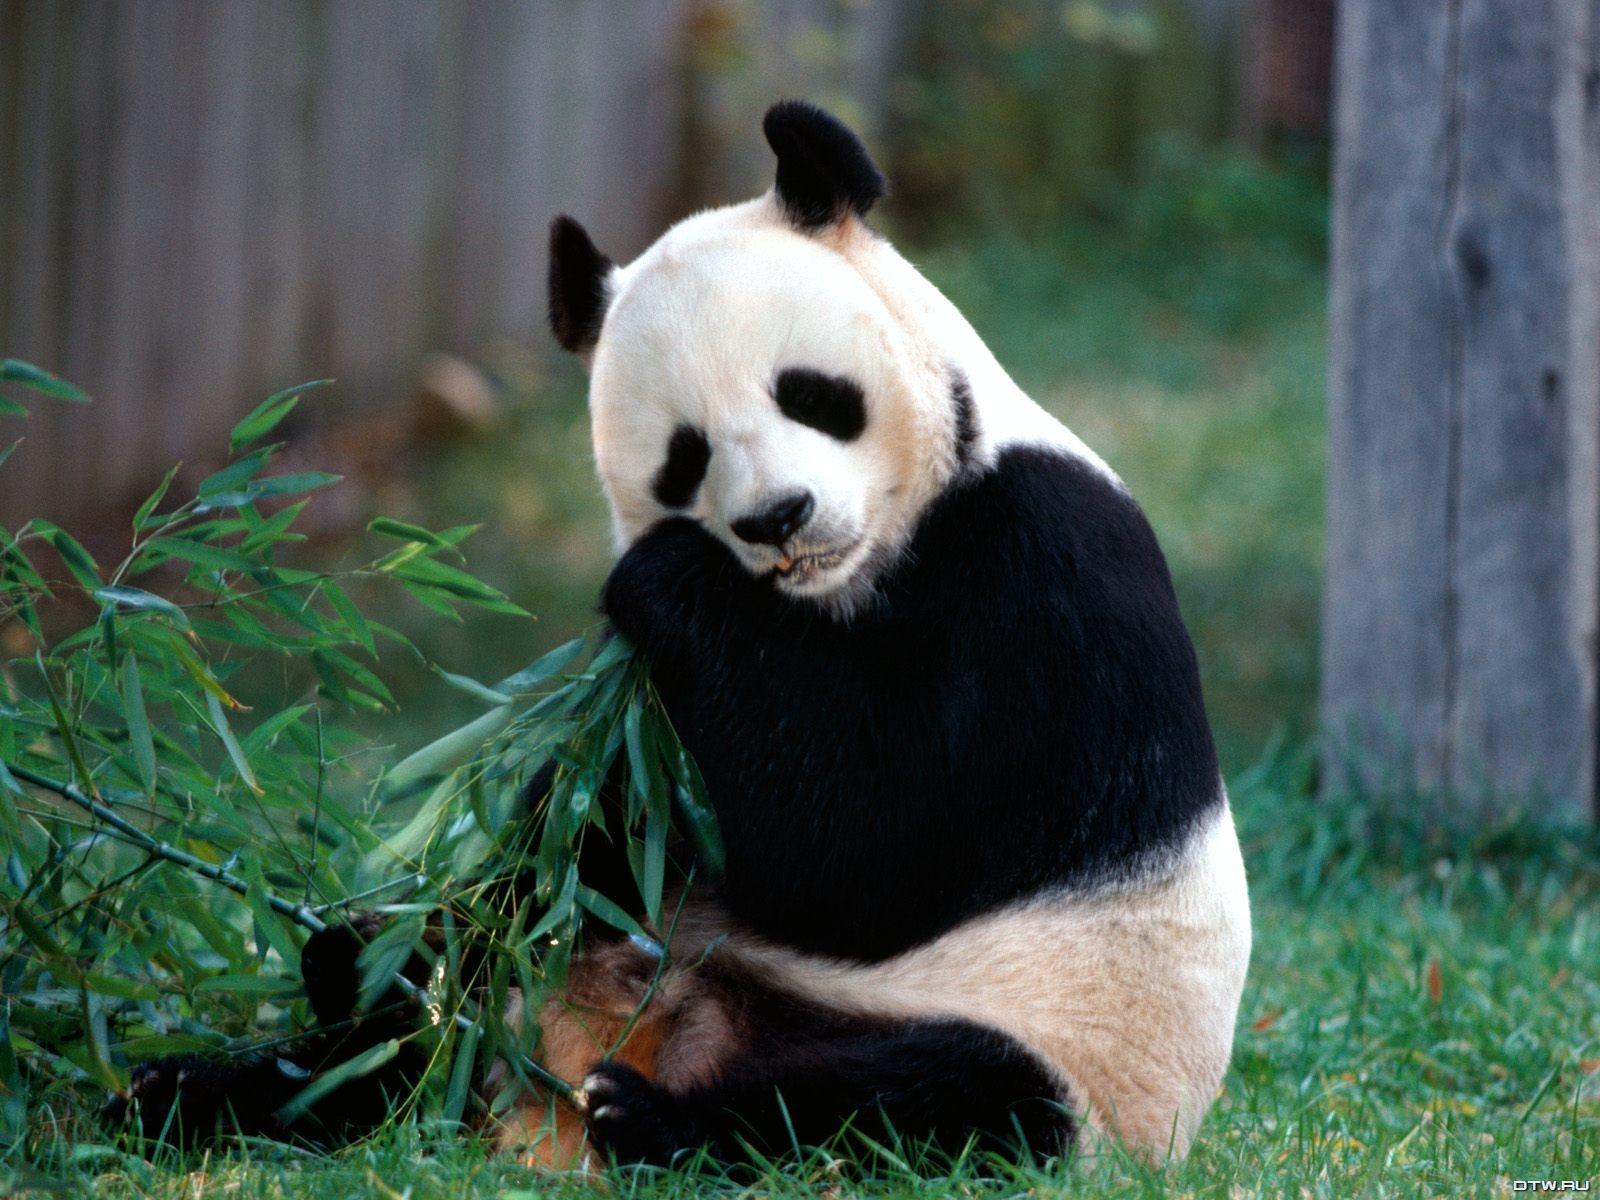 Cute Baby Panda Desktop Wallpapers 3d wallpapers 1600x1200